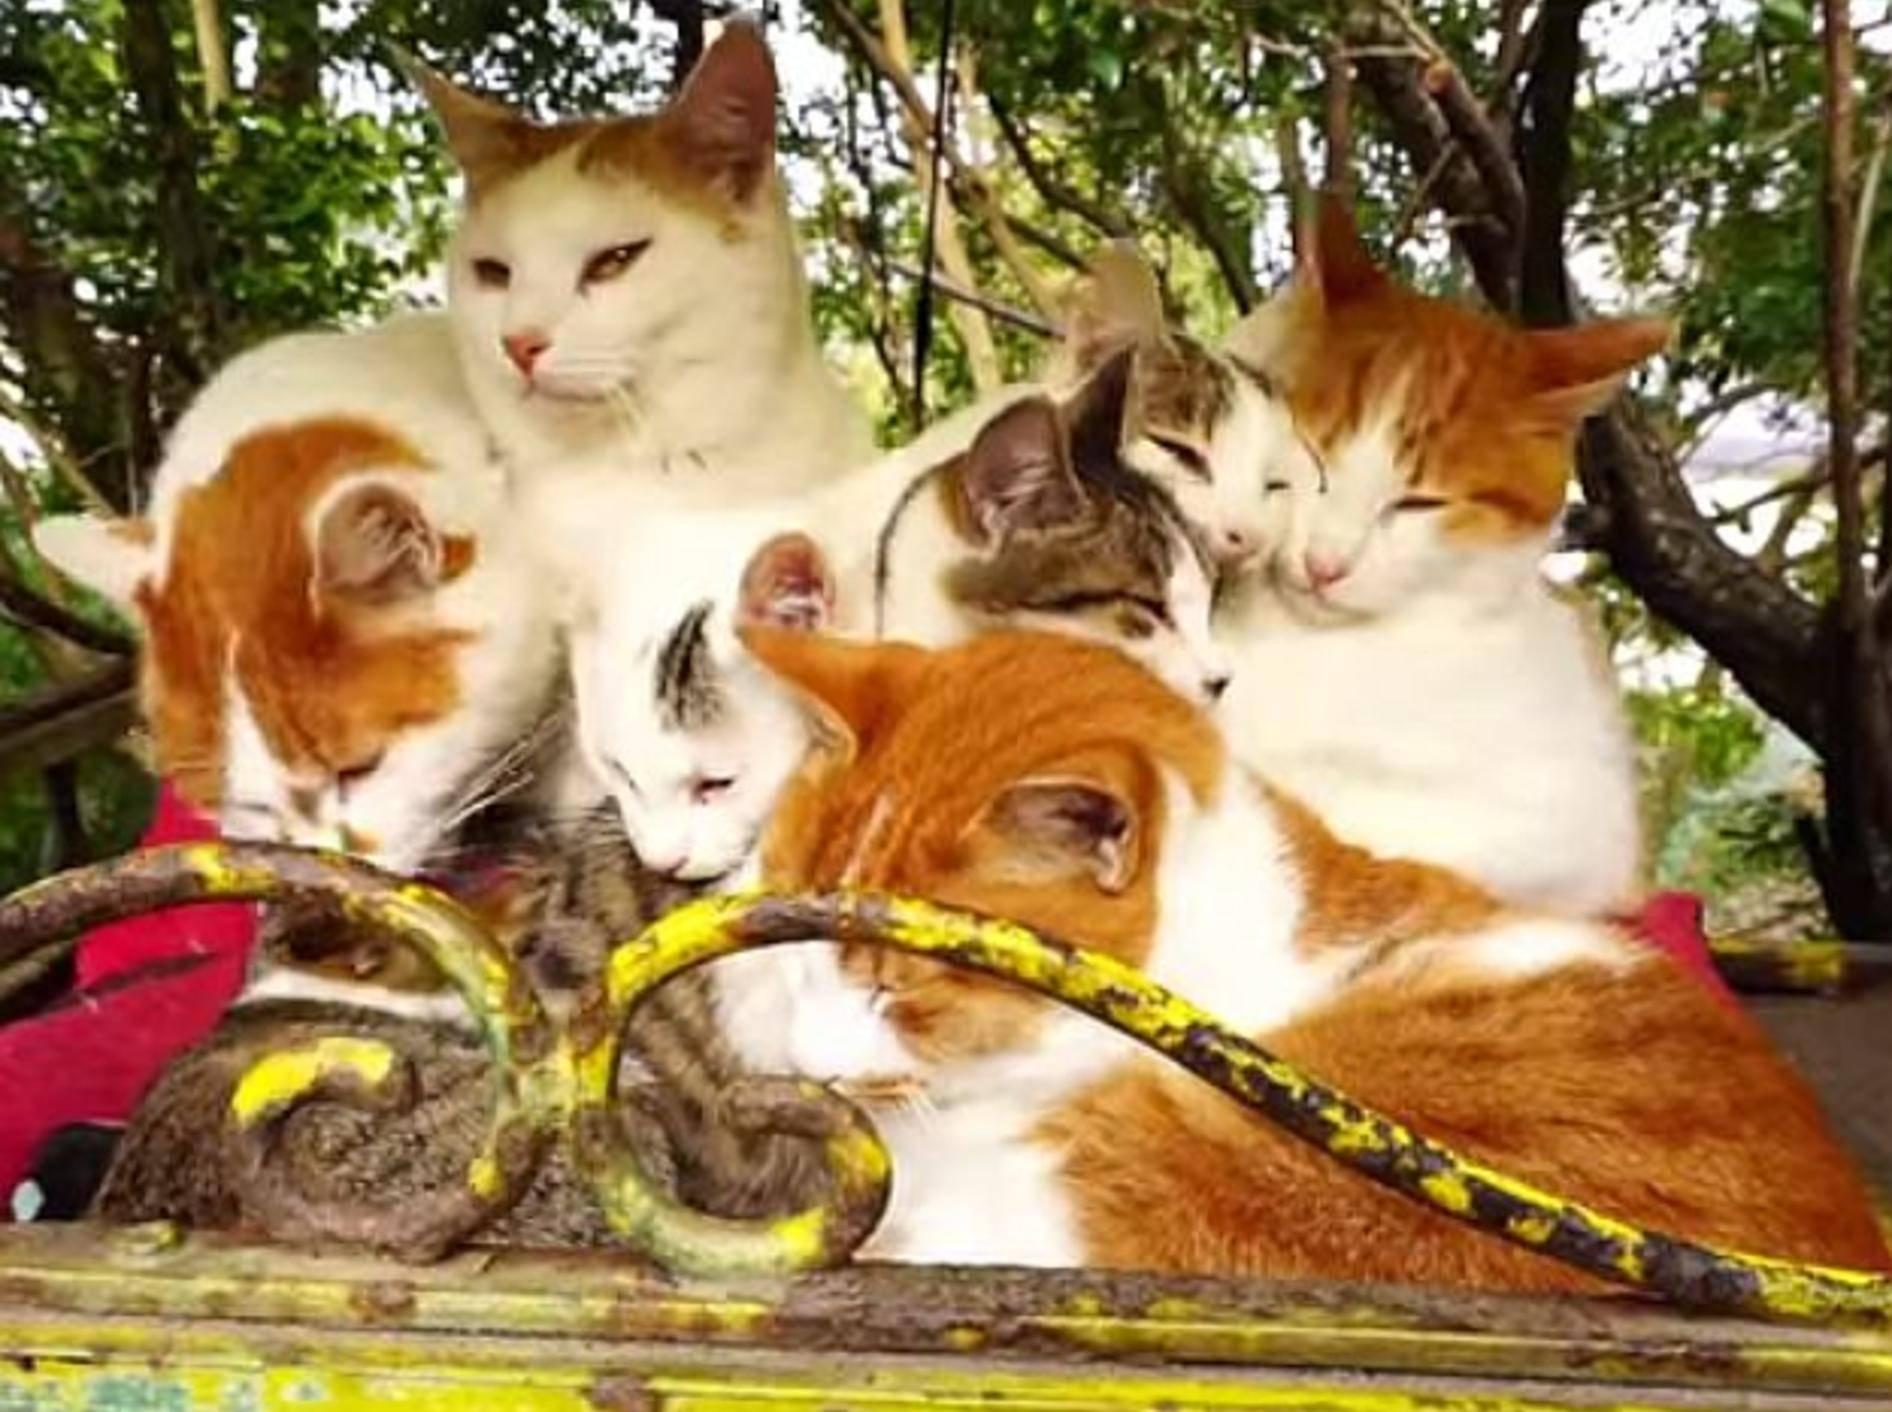 Gruppenkuscheln bei ein paar süßen Katzenkumpels – Bild: Youtube / Nyanta8355